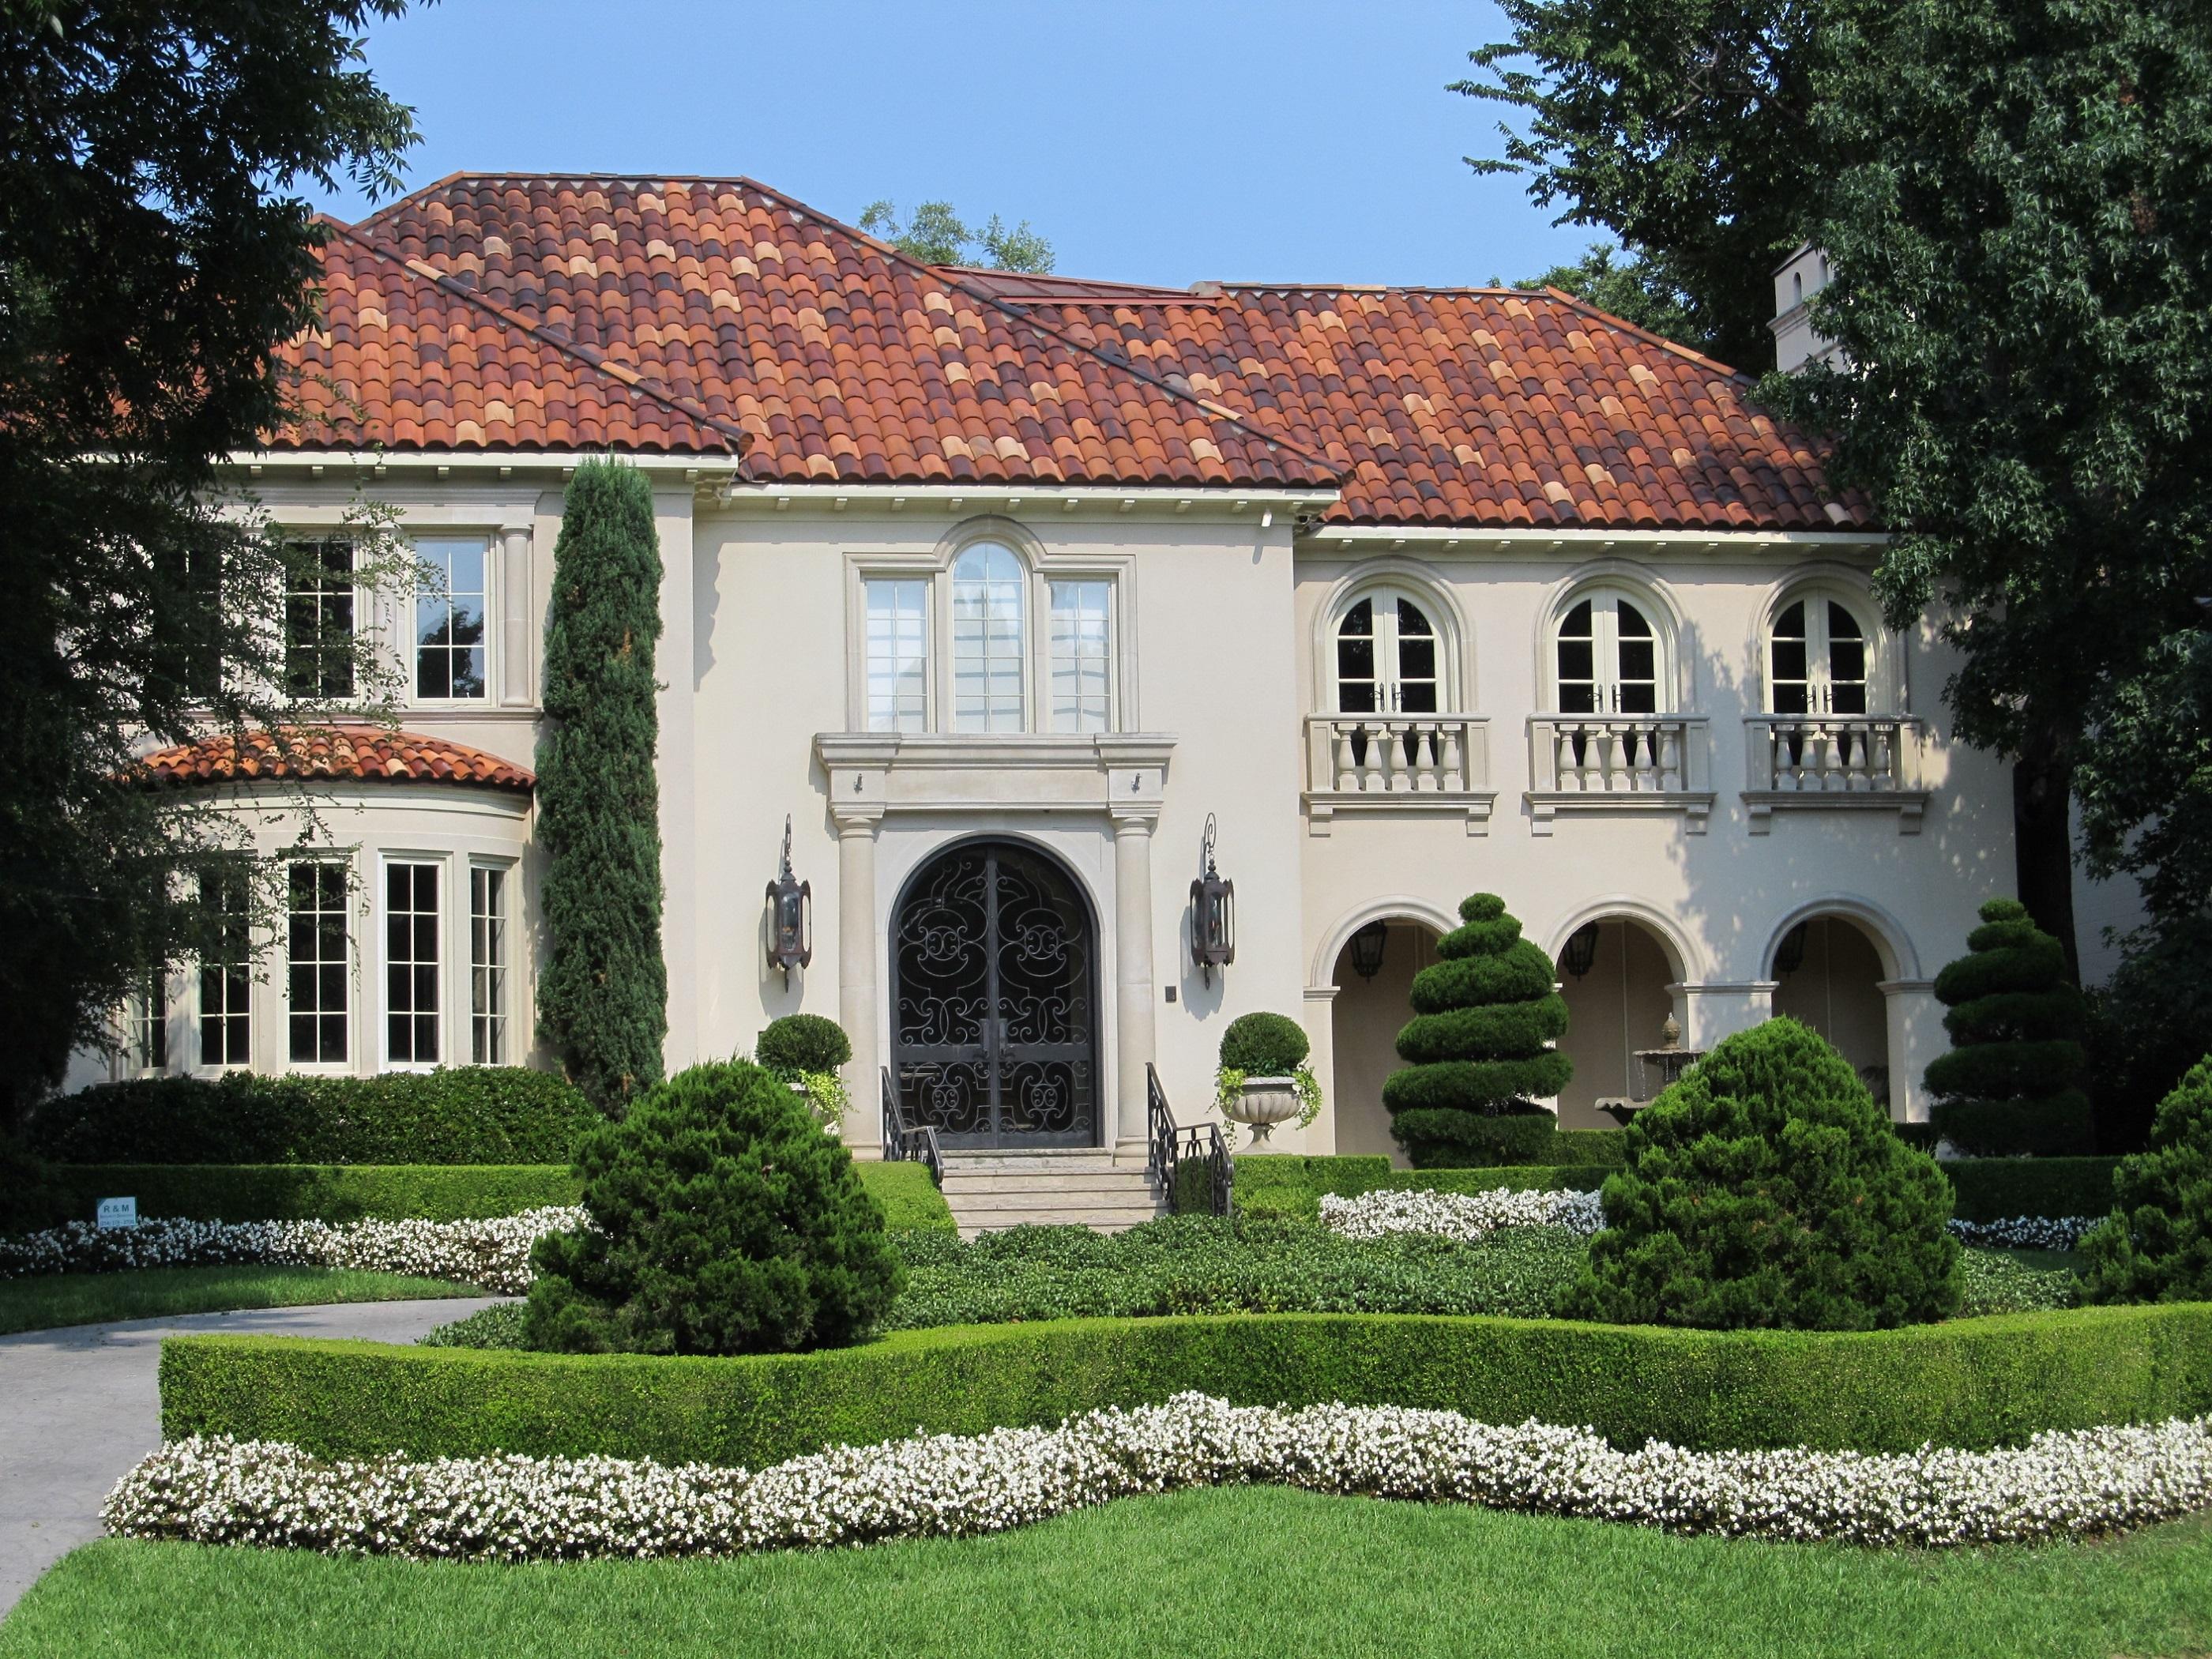 Image Result For Address Of Hgtv Dream Home